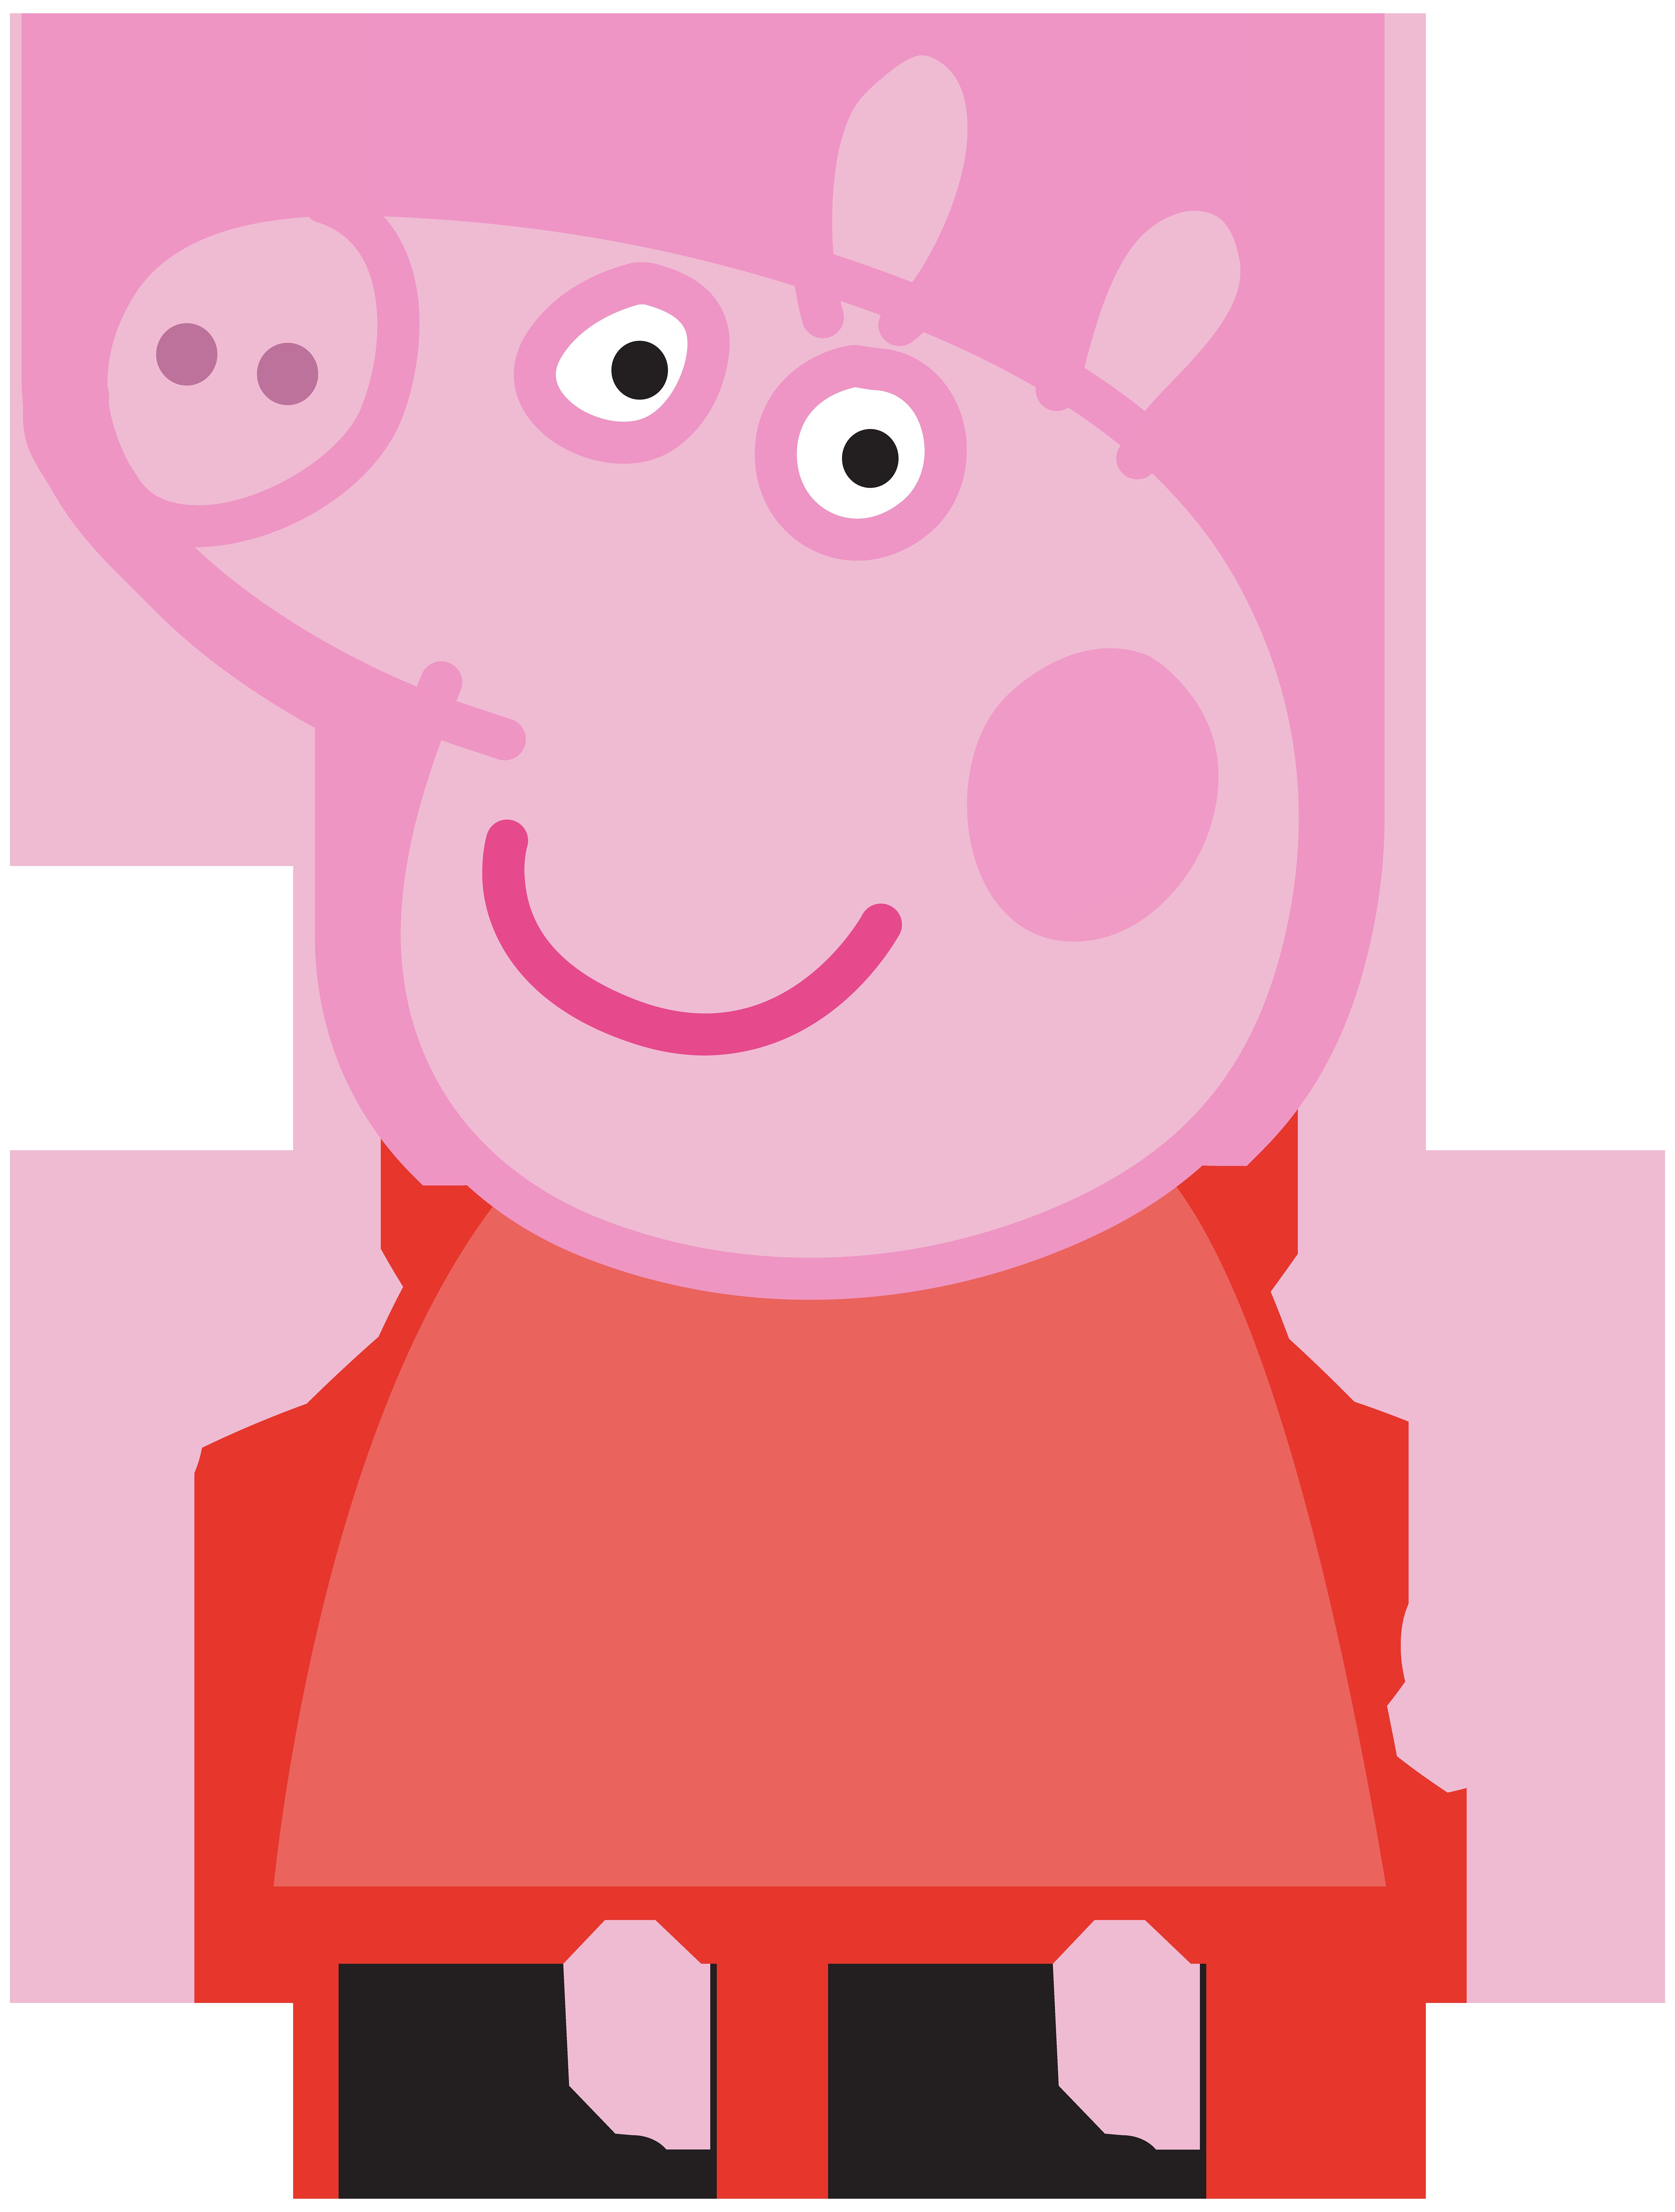 Peppa Pig Transparent PNG Image.